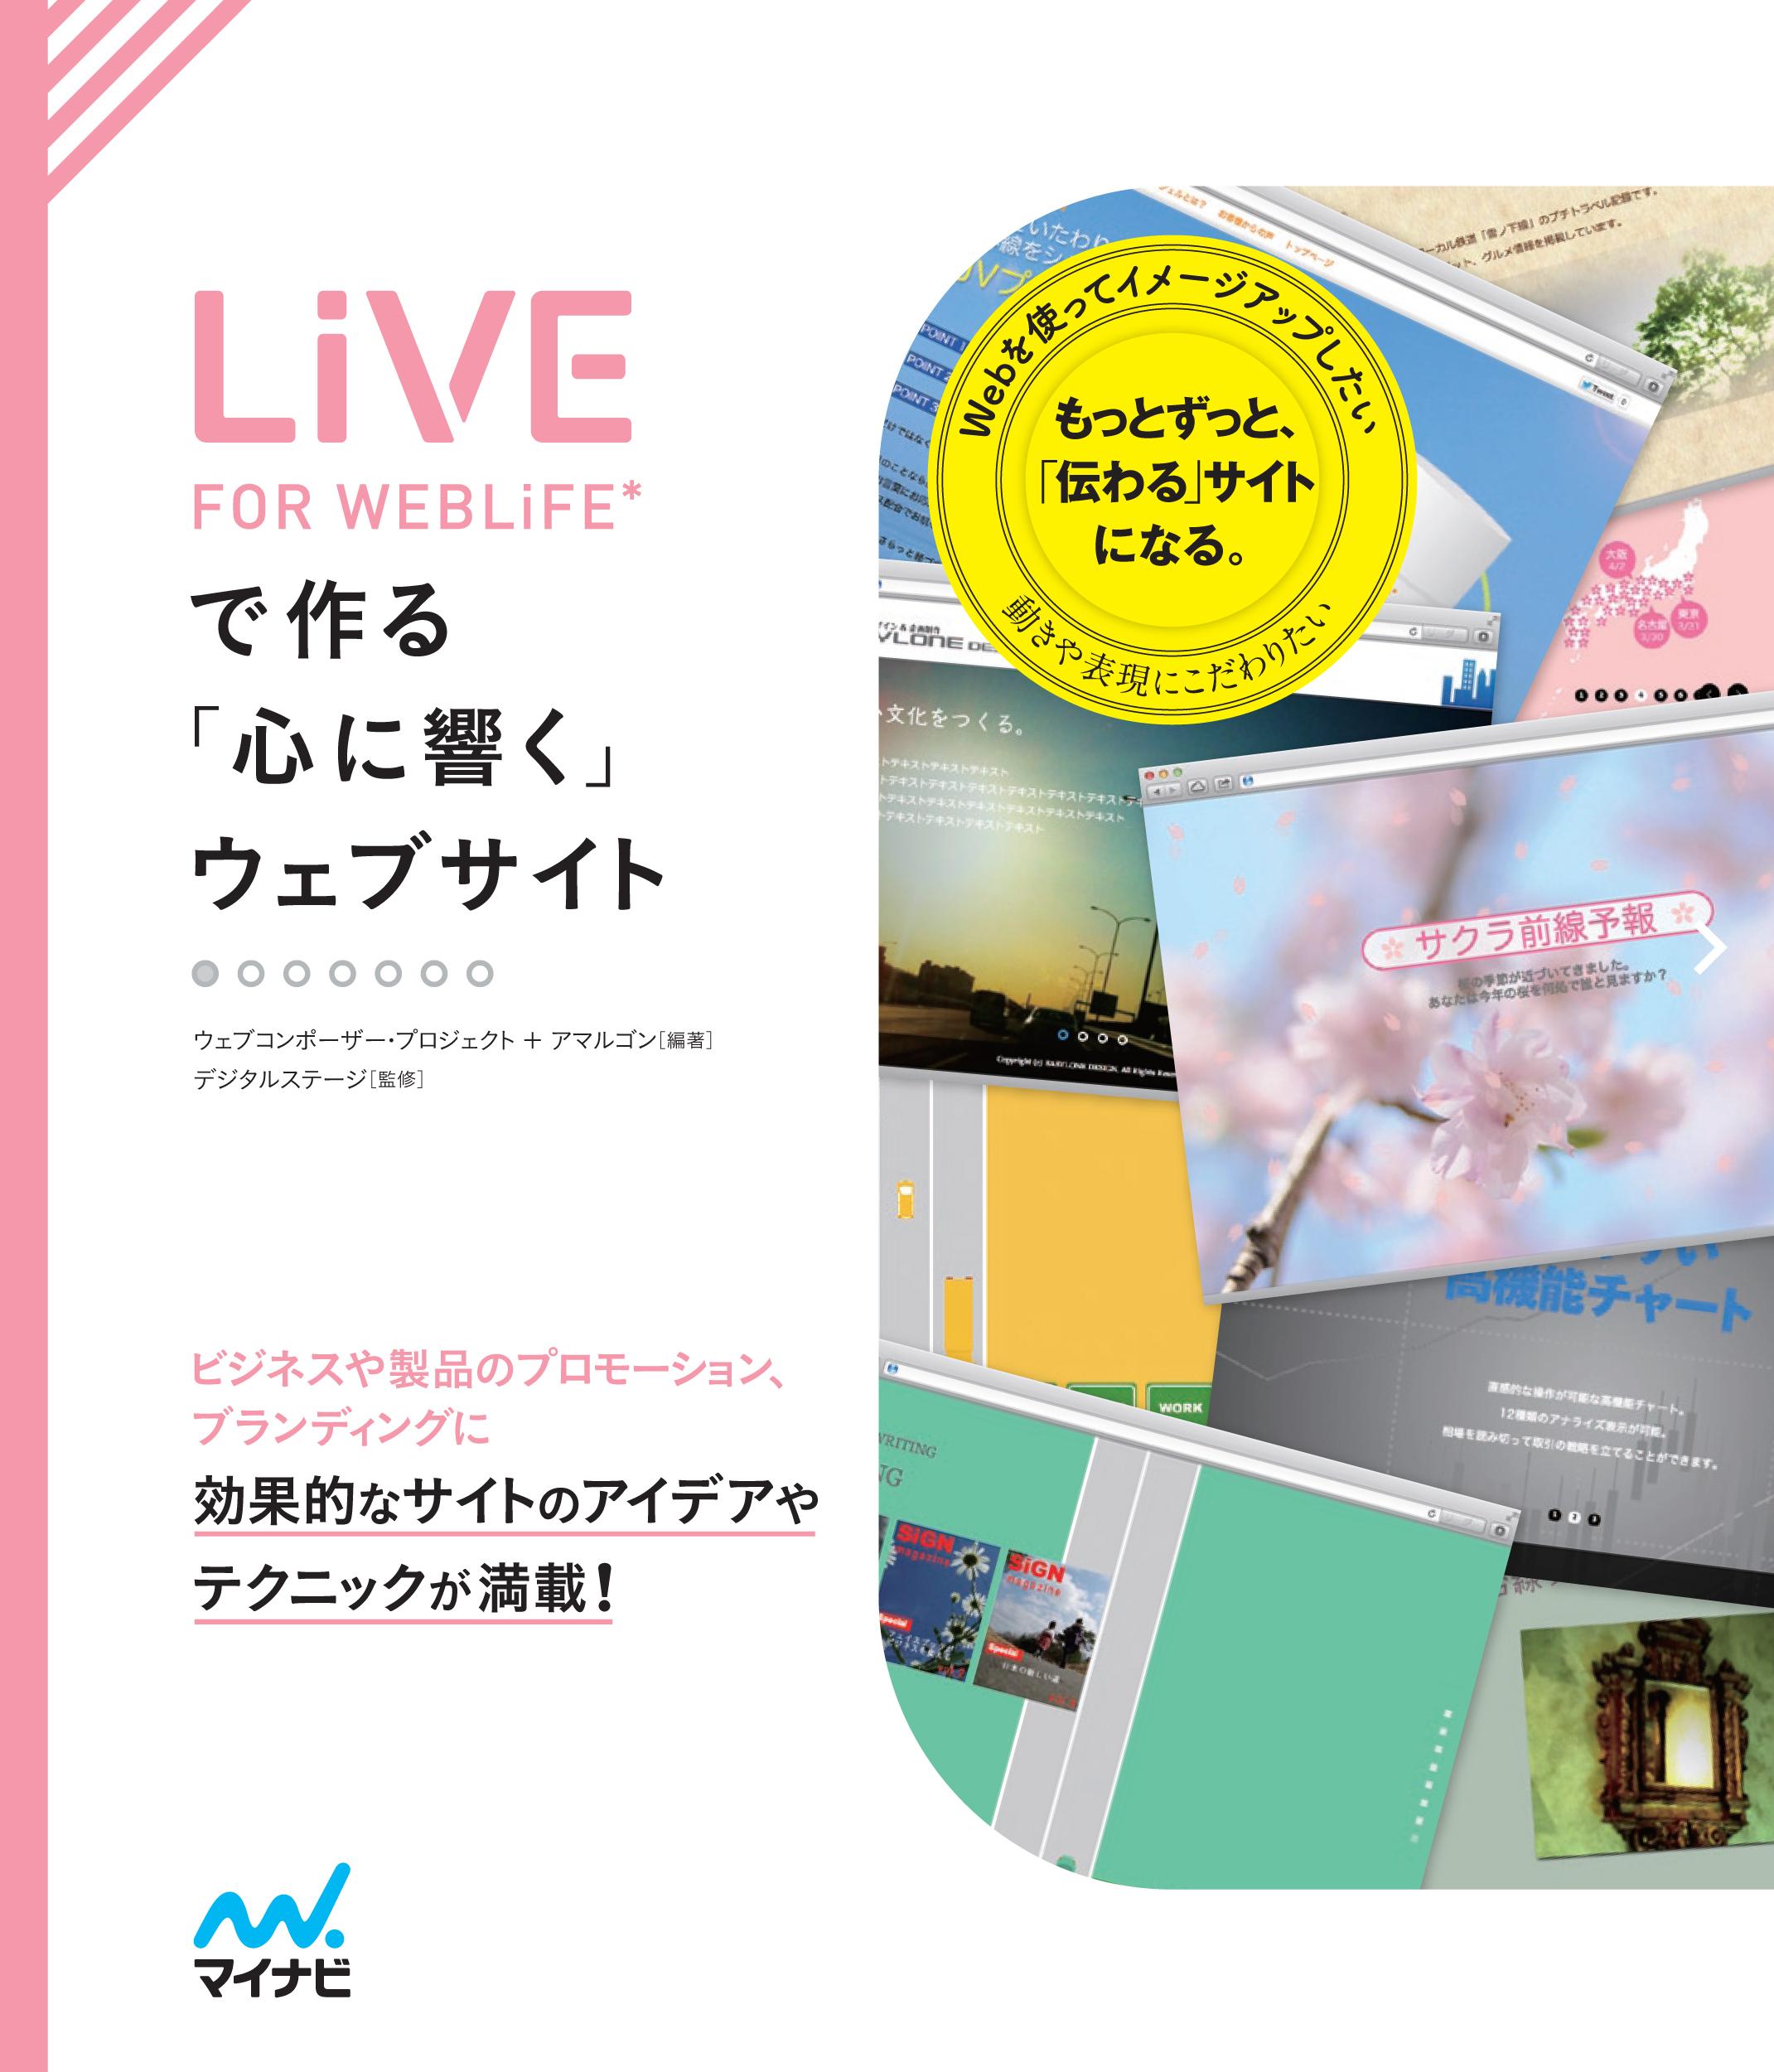 201303_liveBook.jpg